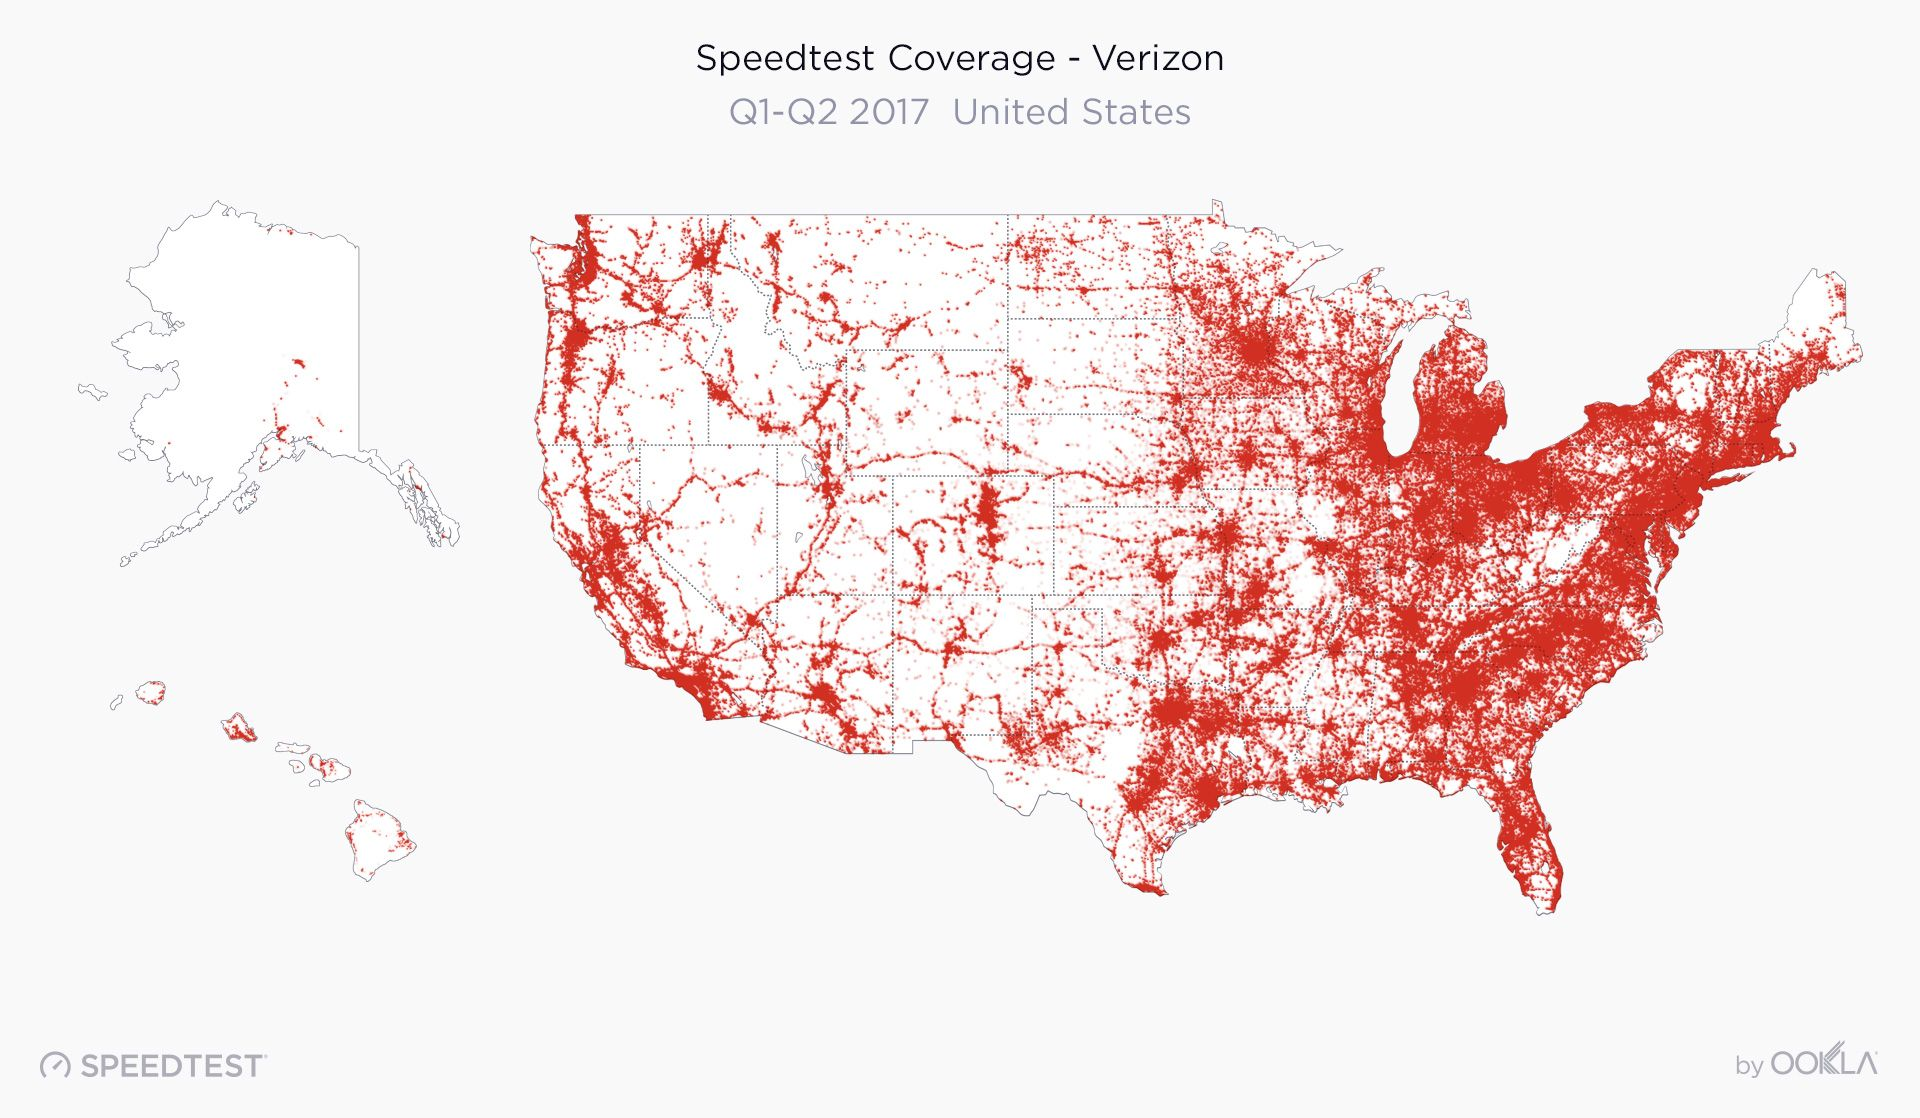 2019 Speedtest U.S. Mobile Performance Report by Ookla